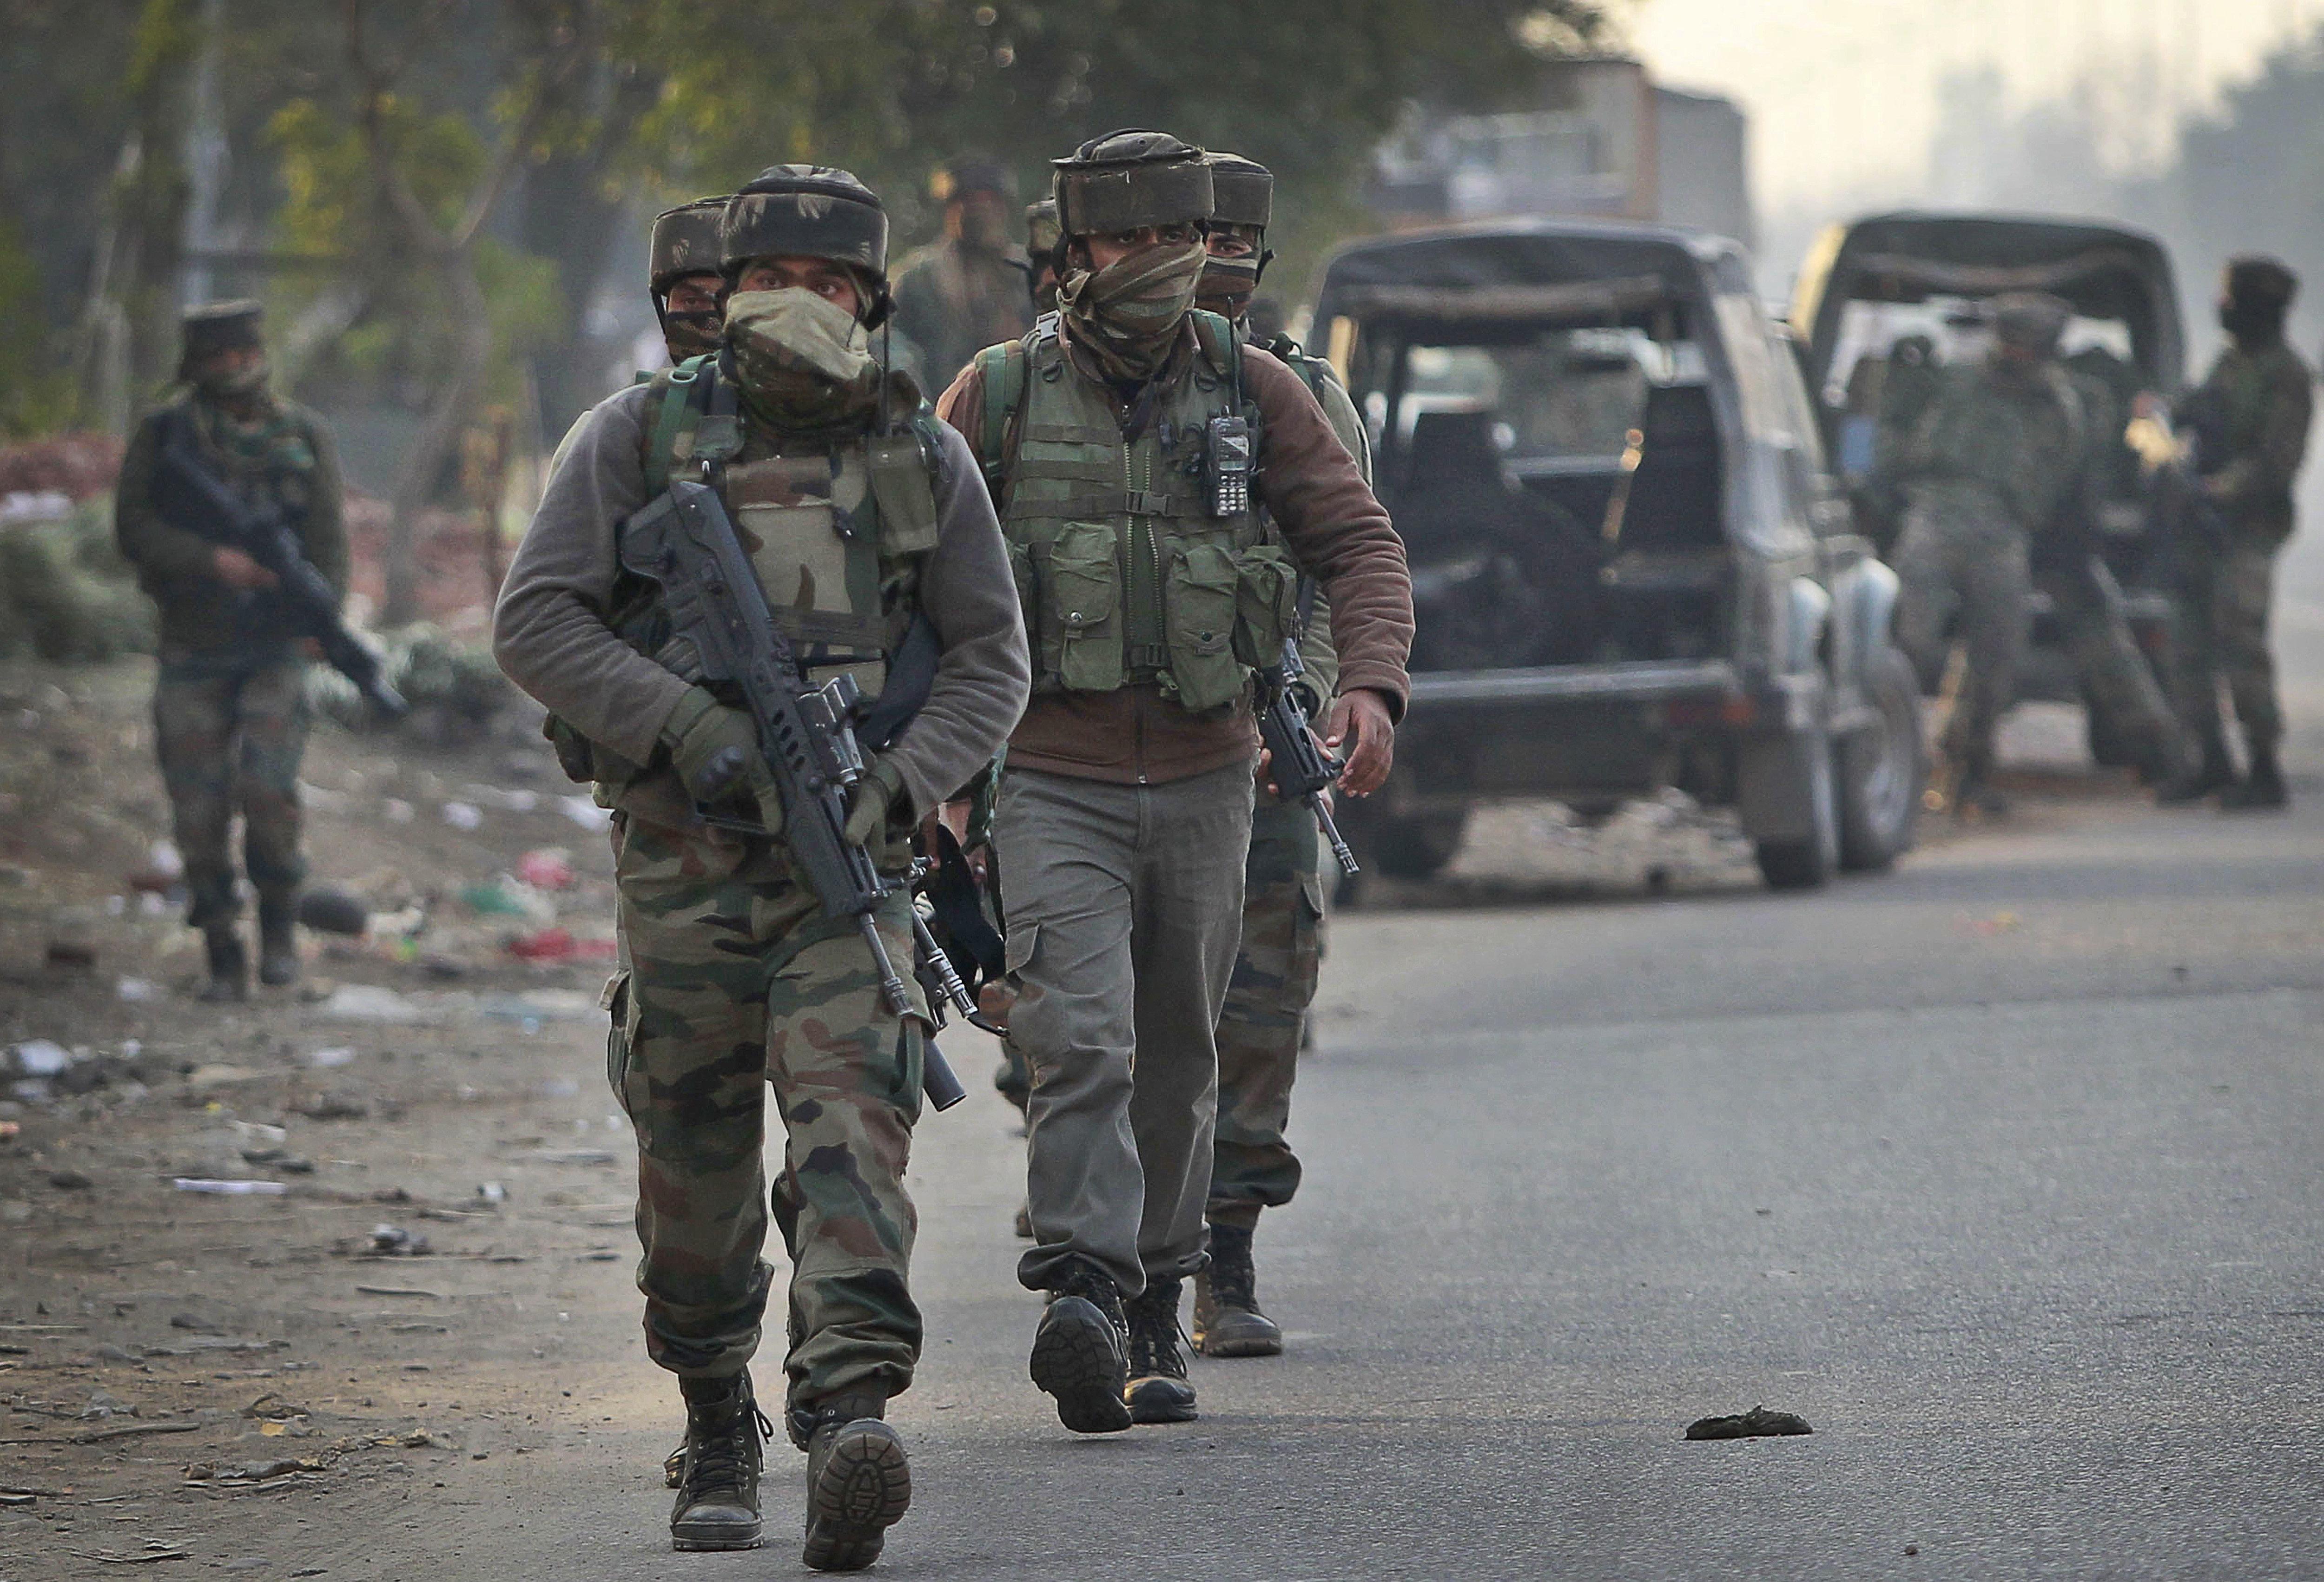 Kashmir: RSS Leader Chandrakanta Sharma Succumbs To Injuries After Militant